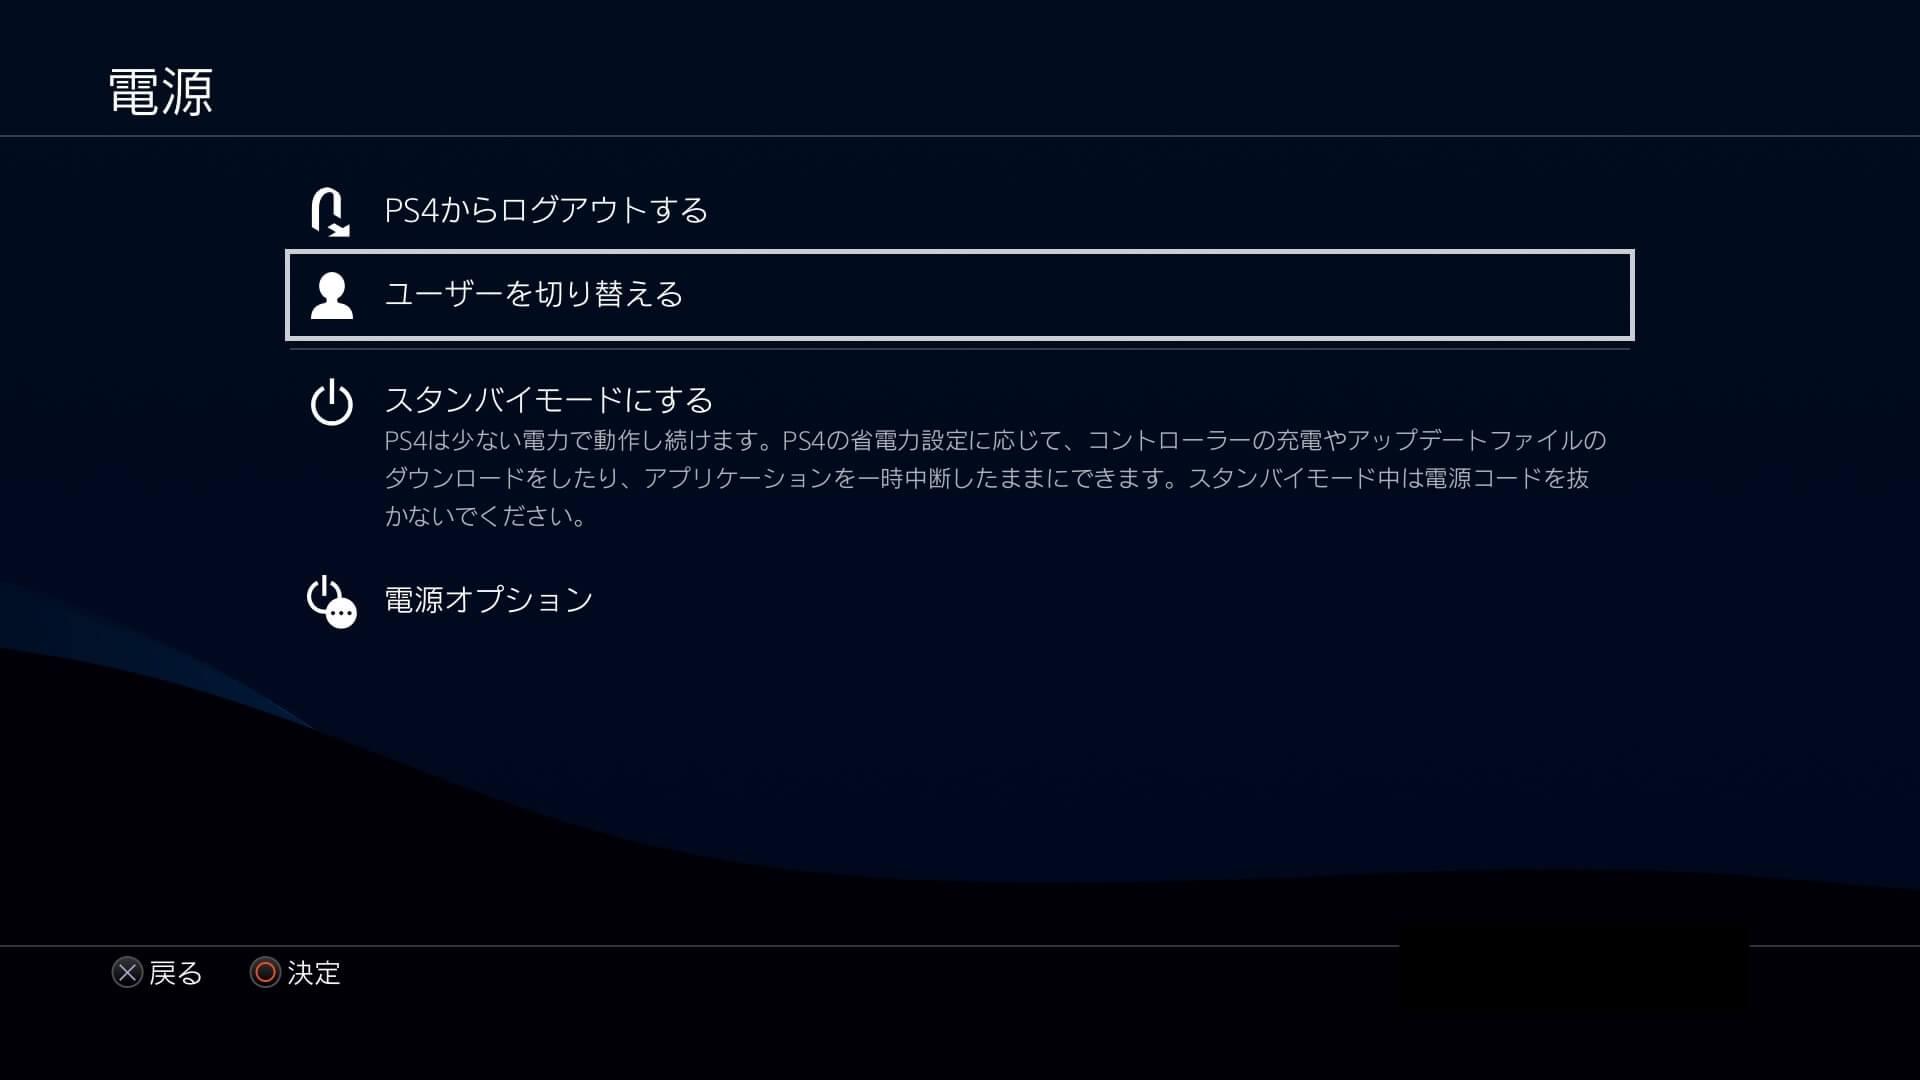 PS4ユーザー切り替え